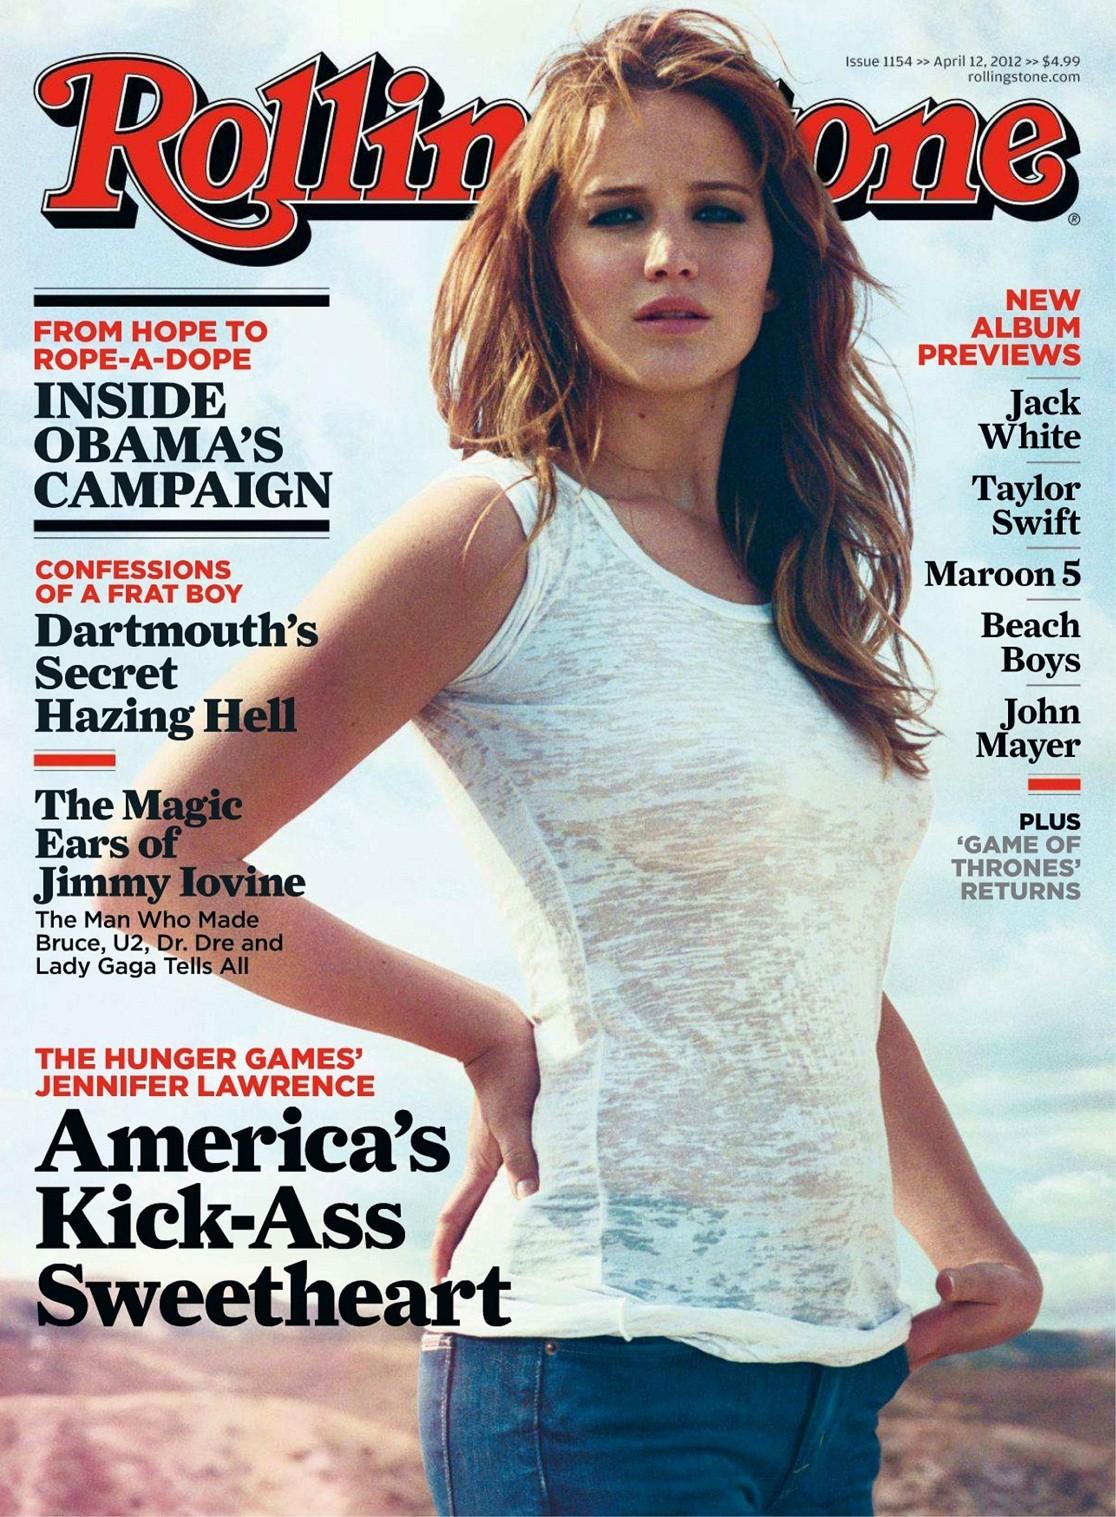 http://1.bp.blogspot.com/-8VyP97b0MUI/T9NhnAKtwOI/AAAAAAAAJSY/R_QurahxgBM/s1600/Jennifer+Lawrence+on+Rolling+Stone+Magazine.jpg